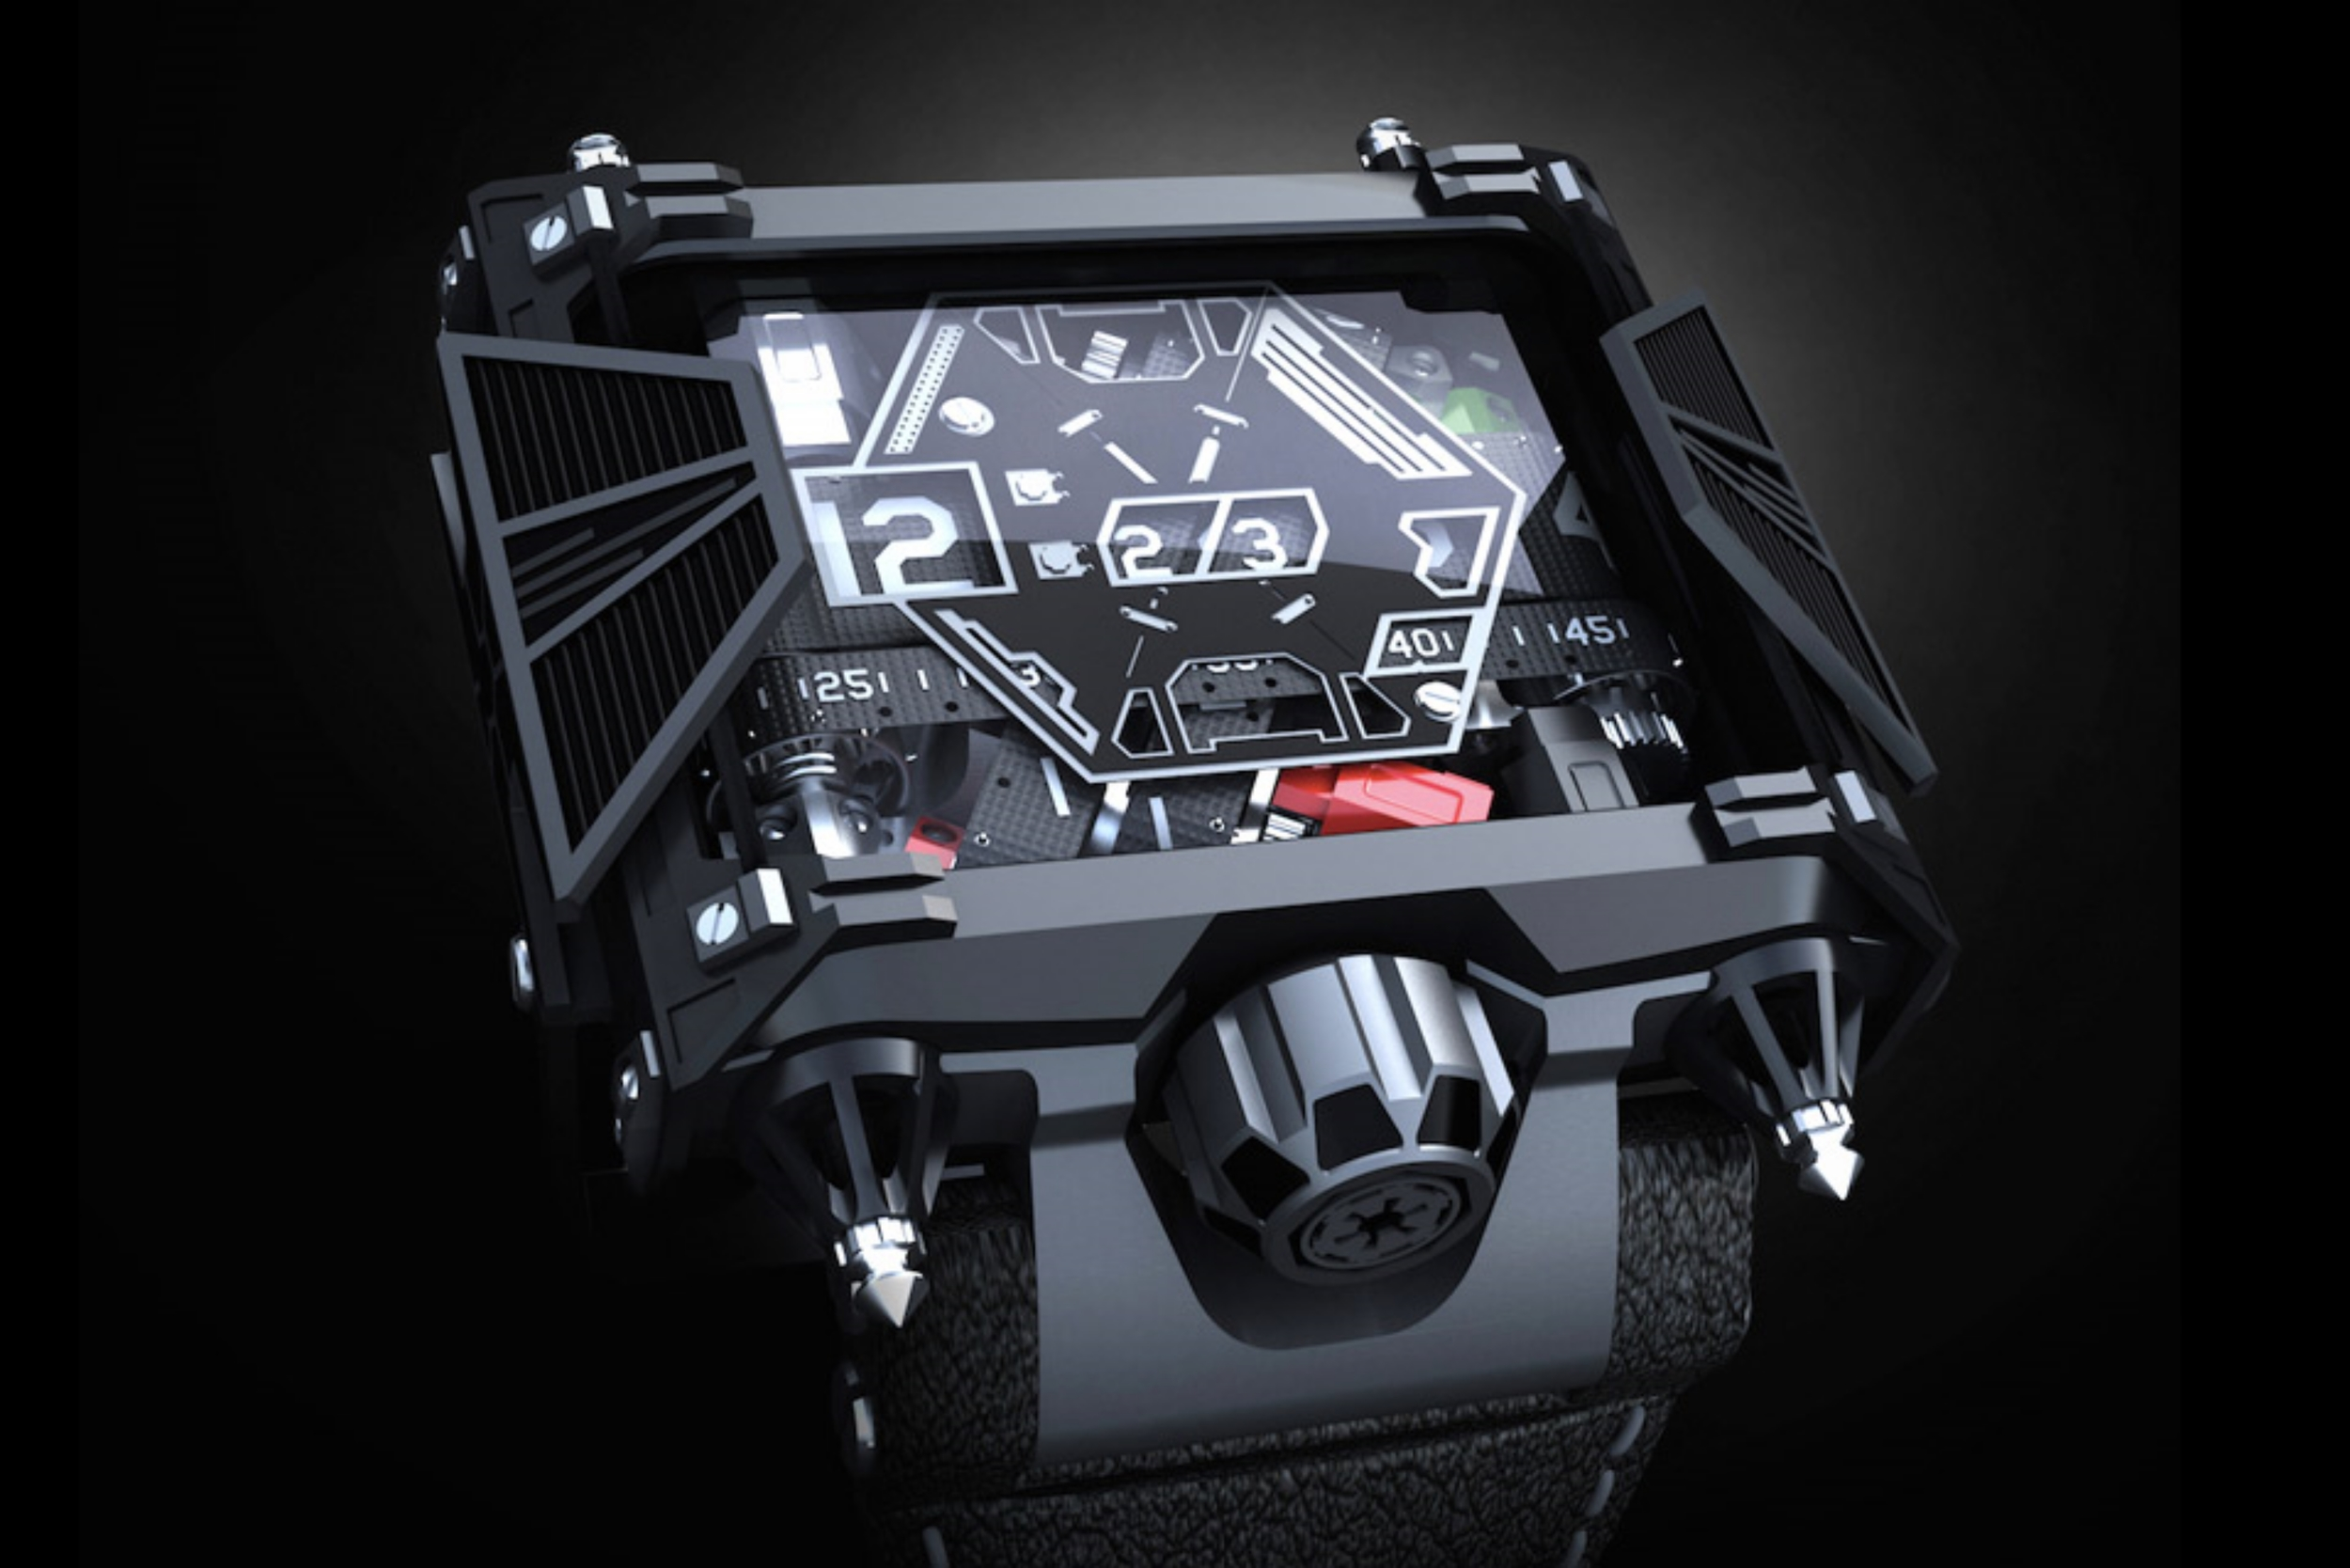 Devon Tread-1 - Star Wars Limited Edition